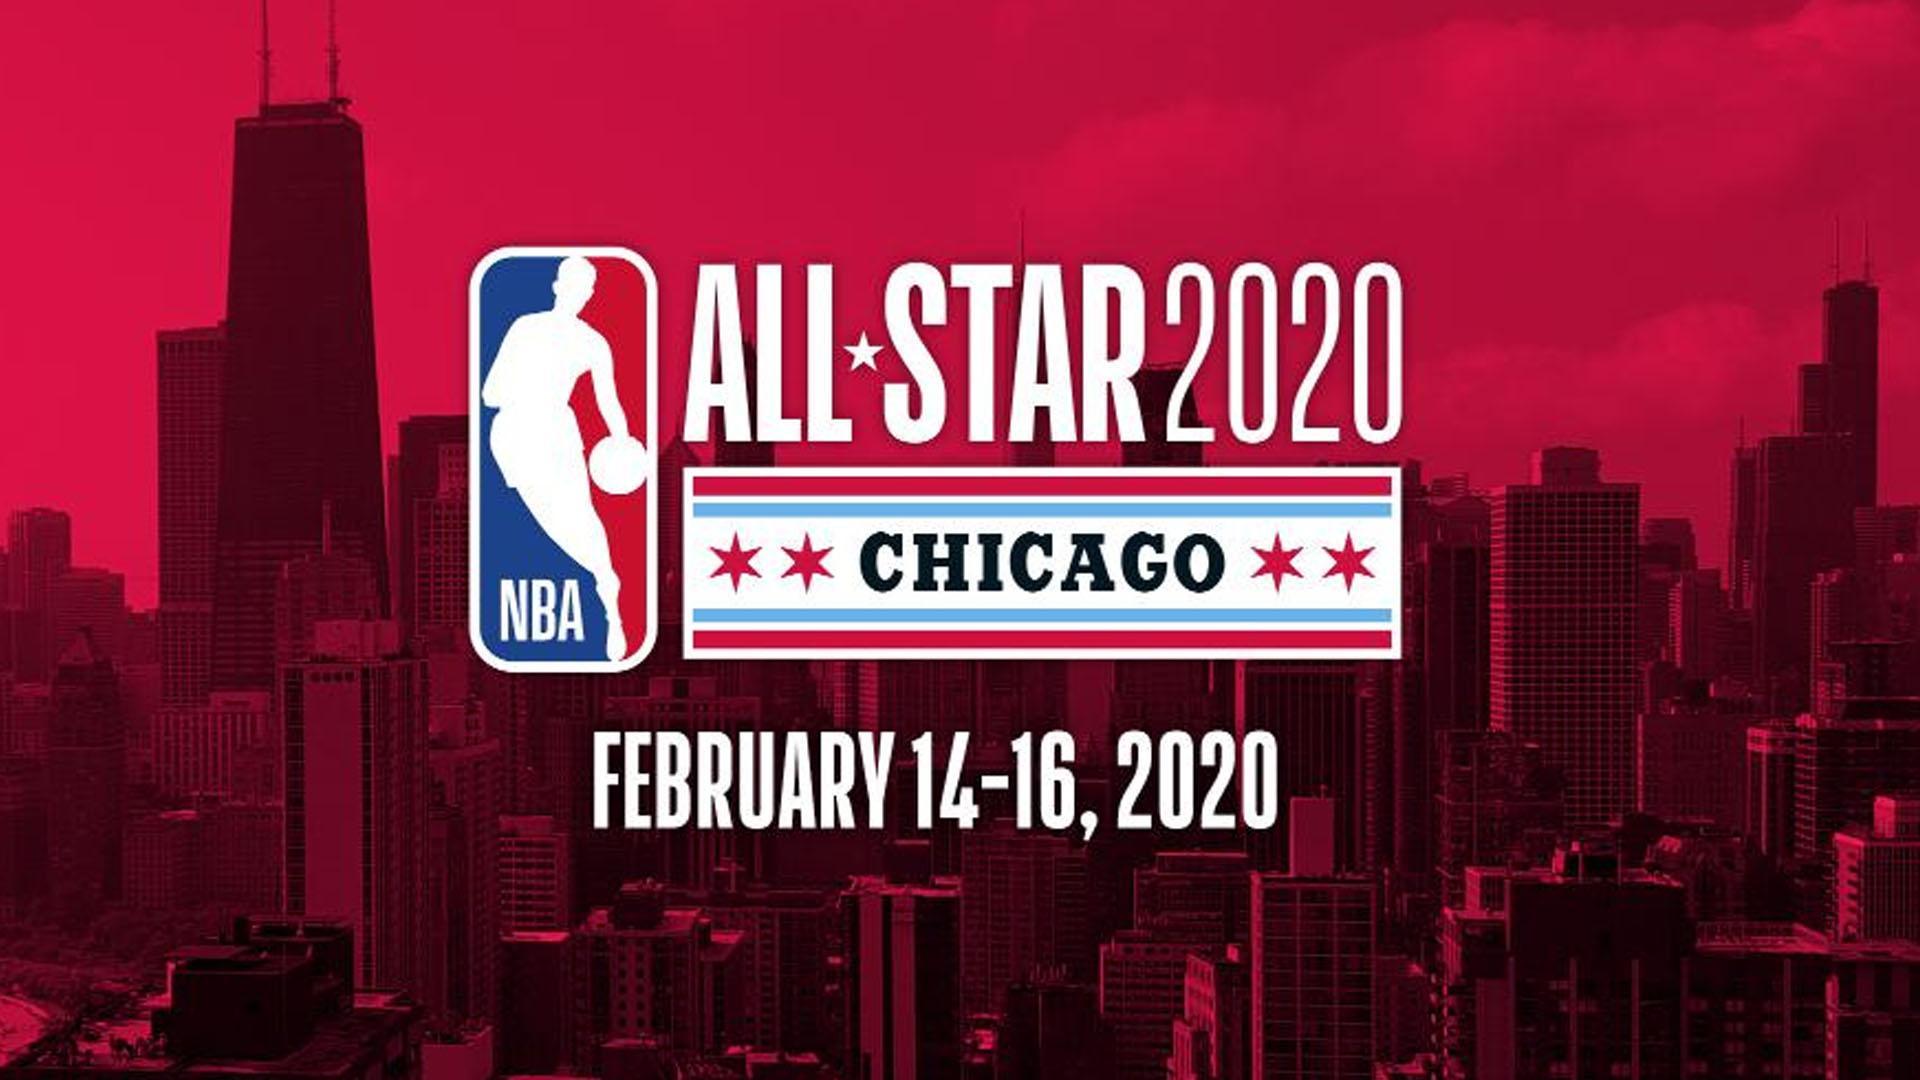 Nba 2020 Wallpapers: NBA All-Star 2020 Wallpapers